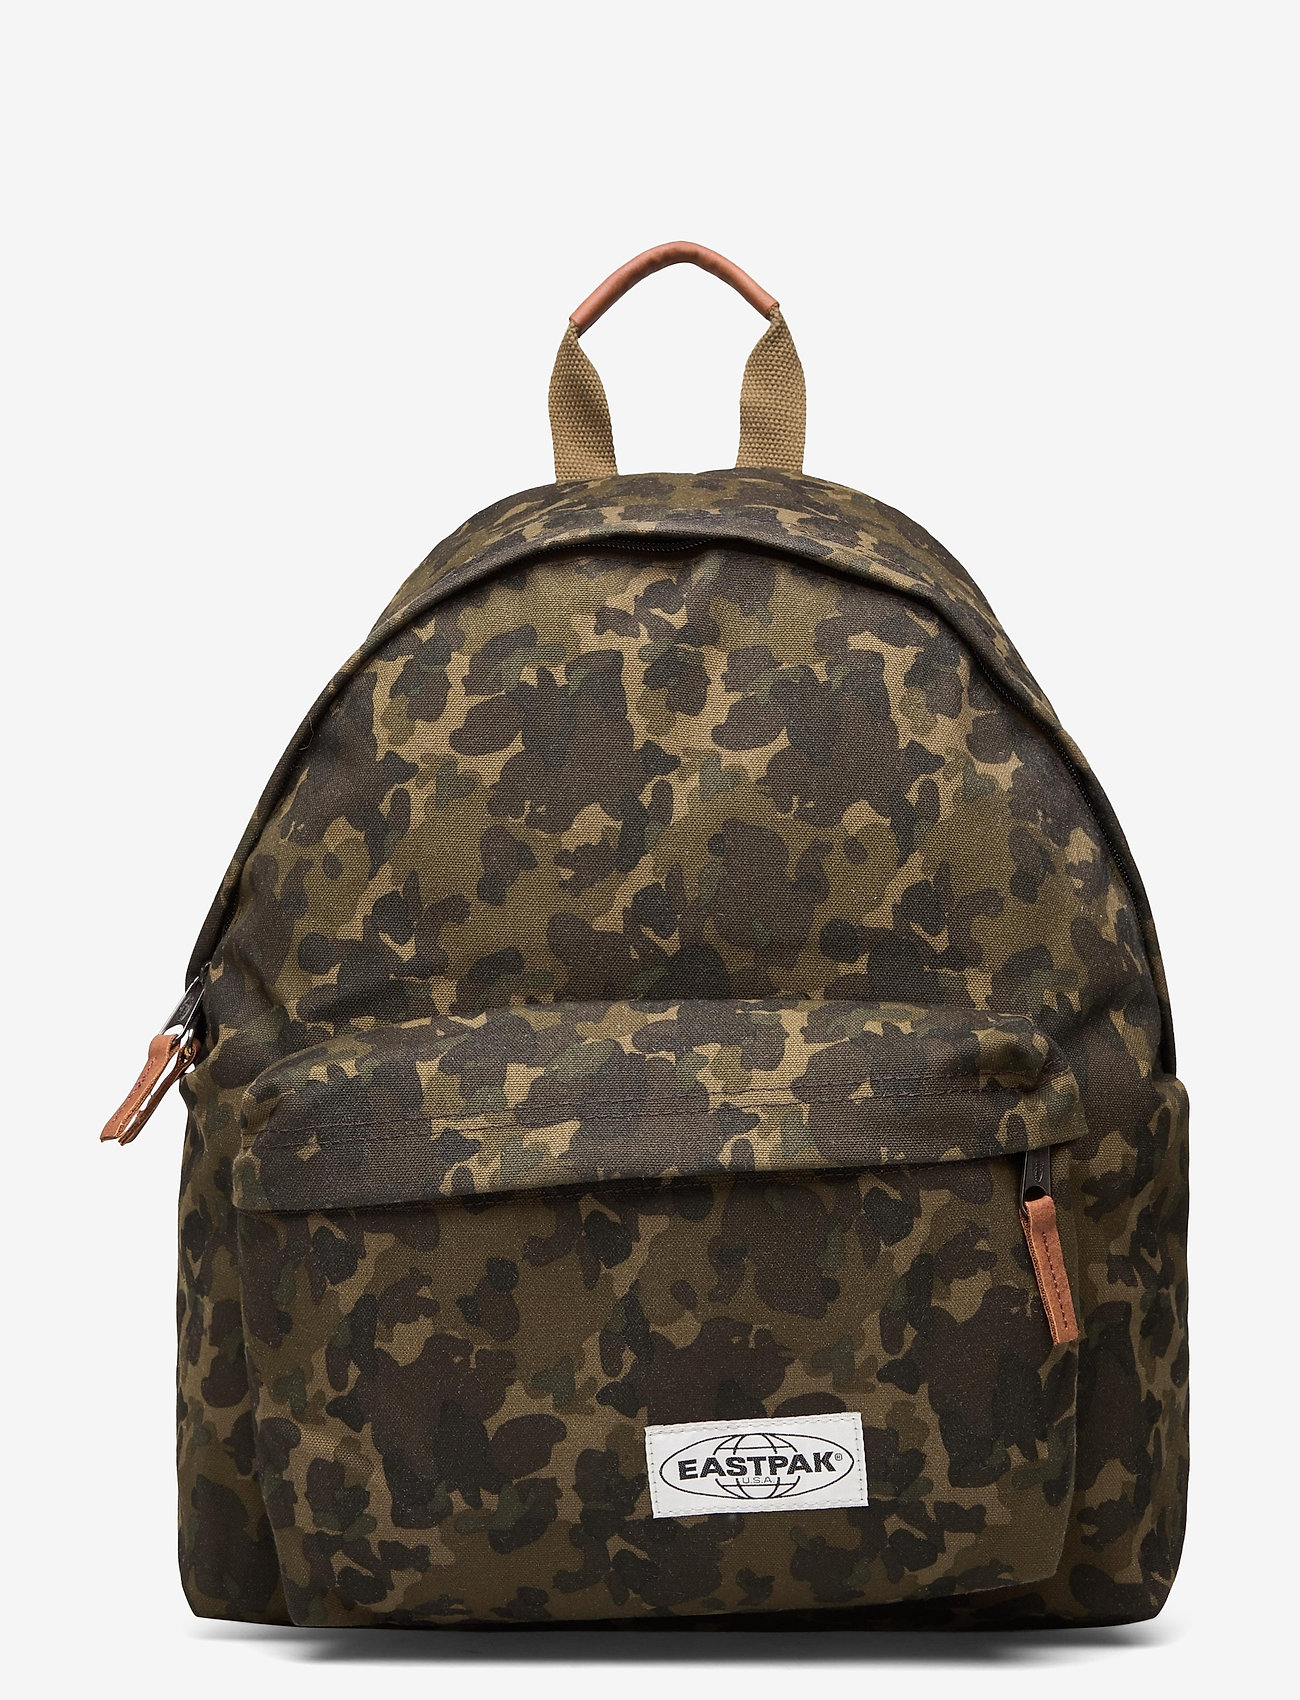 Eastpak - PADDED PAK'R - rucksäcke - opgrade camo - 0